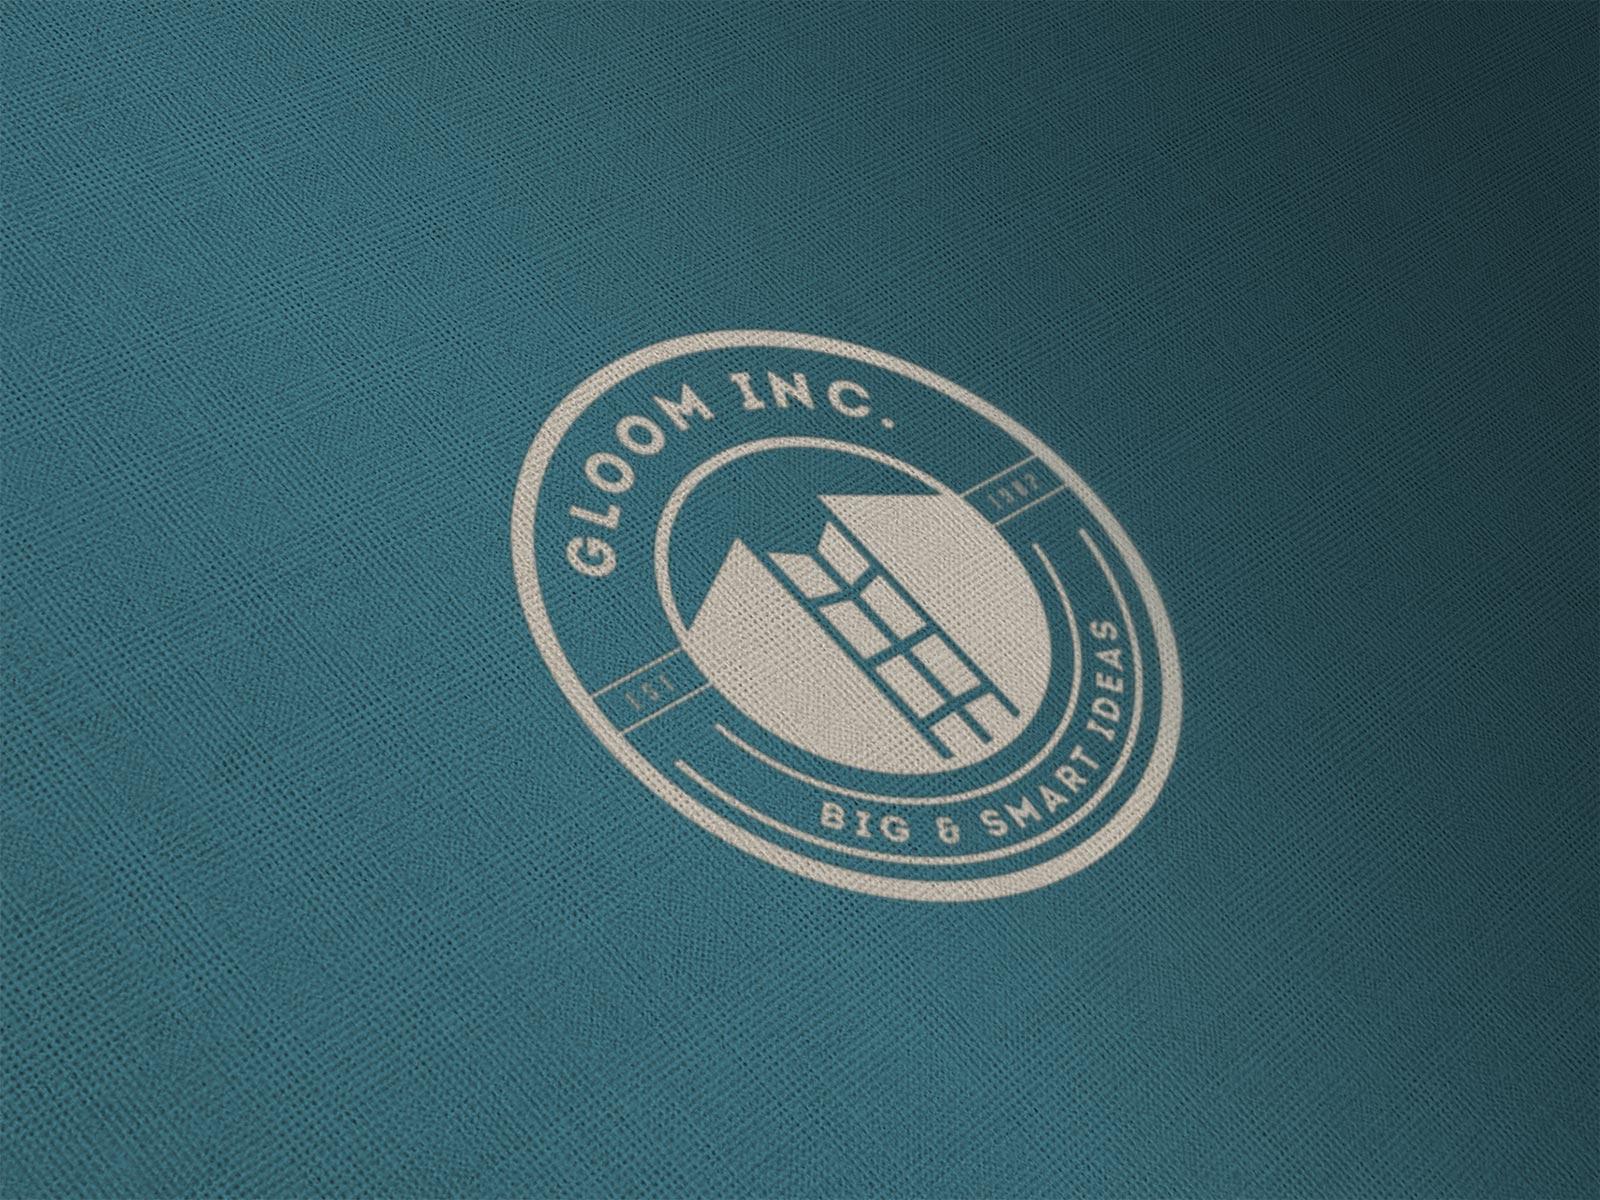 Free-Burlap-Fabric-Cloth-Logo-Mockup-PSD